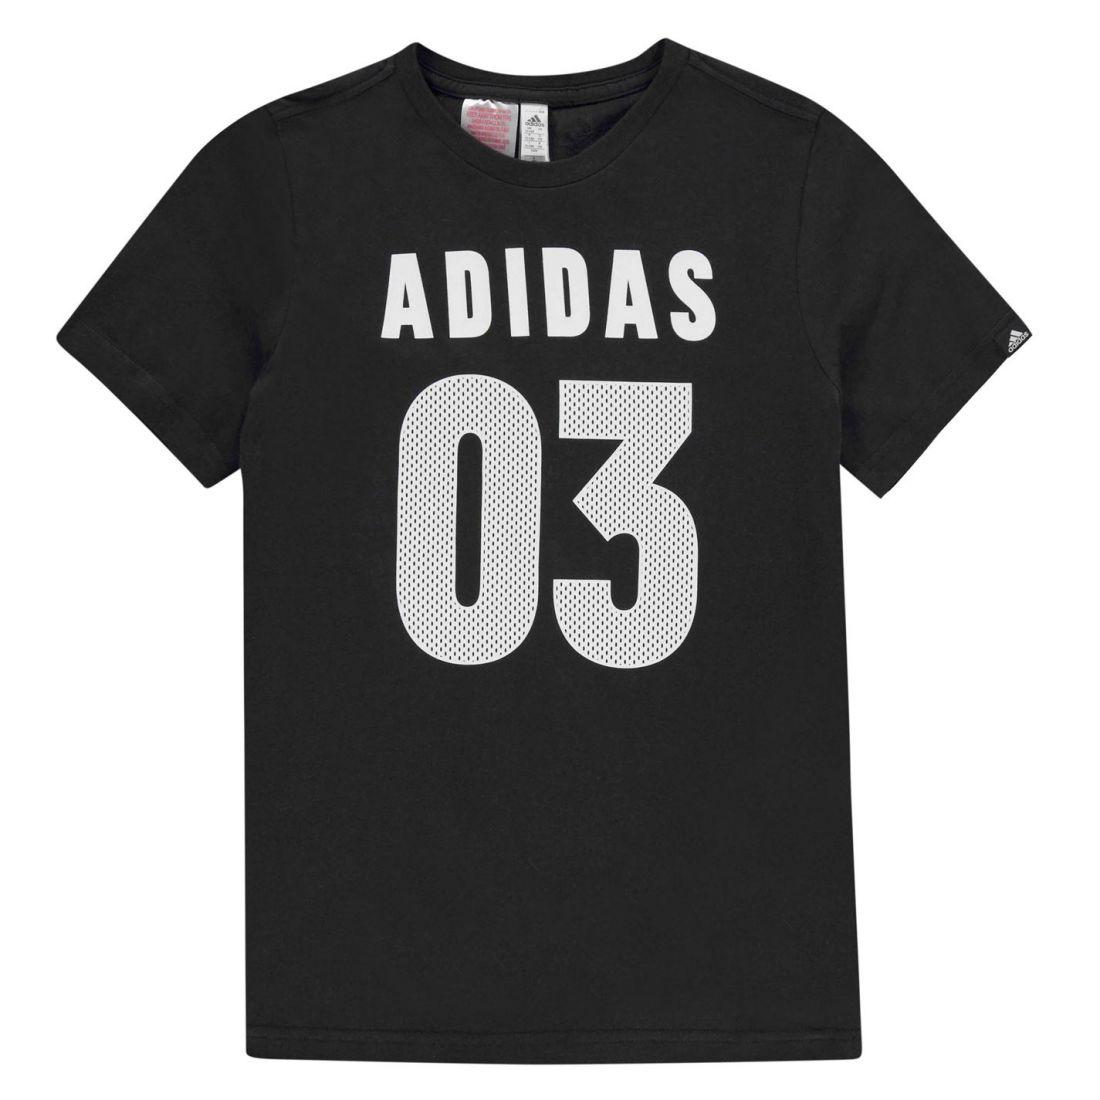 03 Adidas Childrens Top Tee Crew Youngster Shirt Short Neck T Boys xSPcqdfxwr